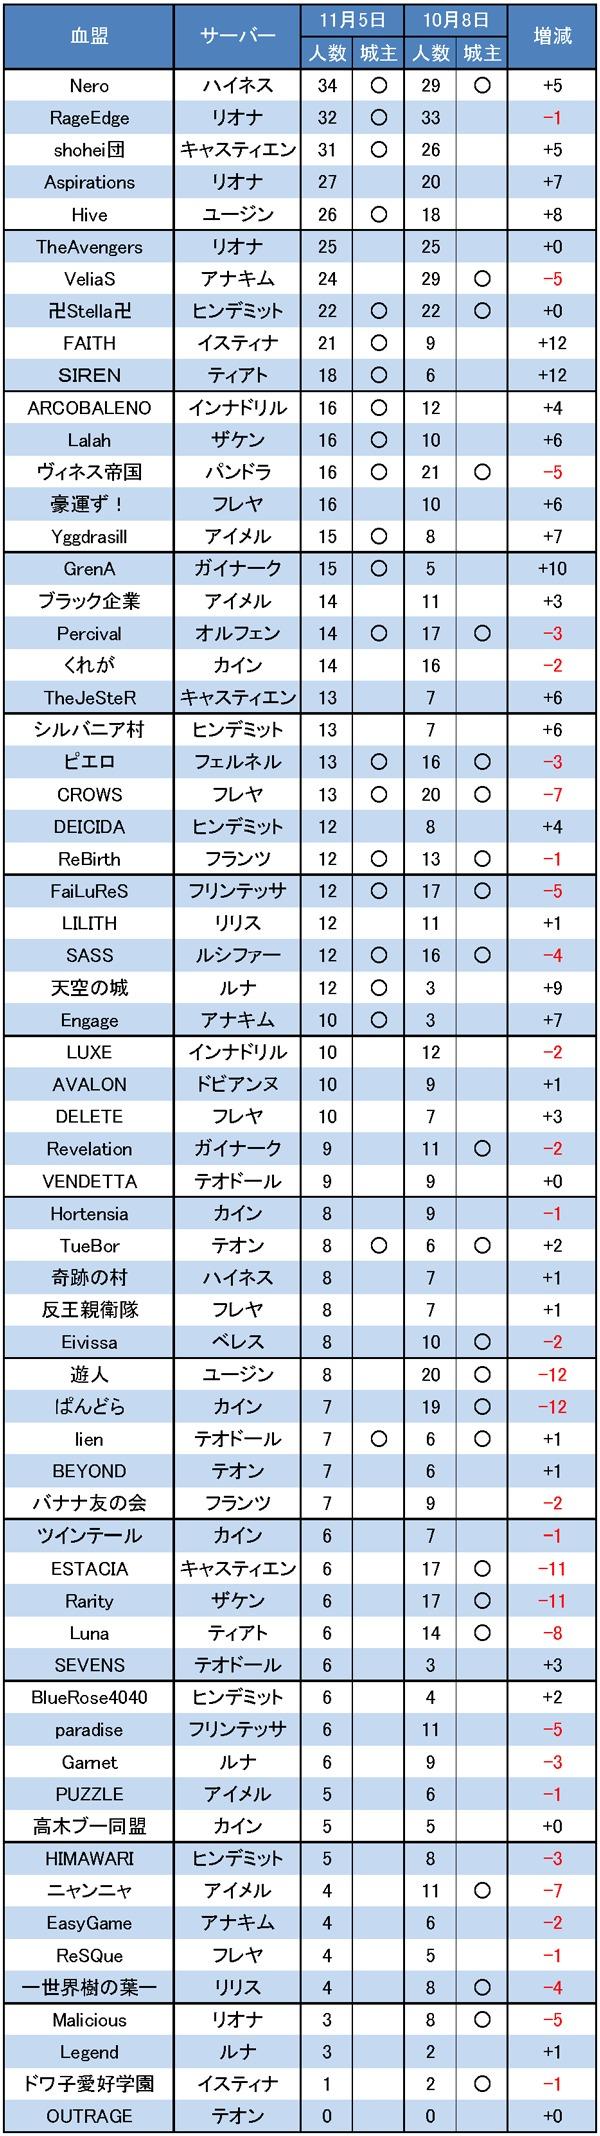 11/5 LRT 増減調査